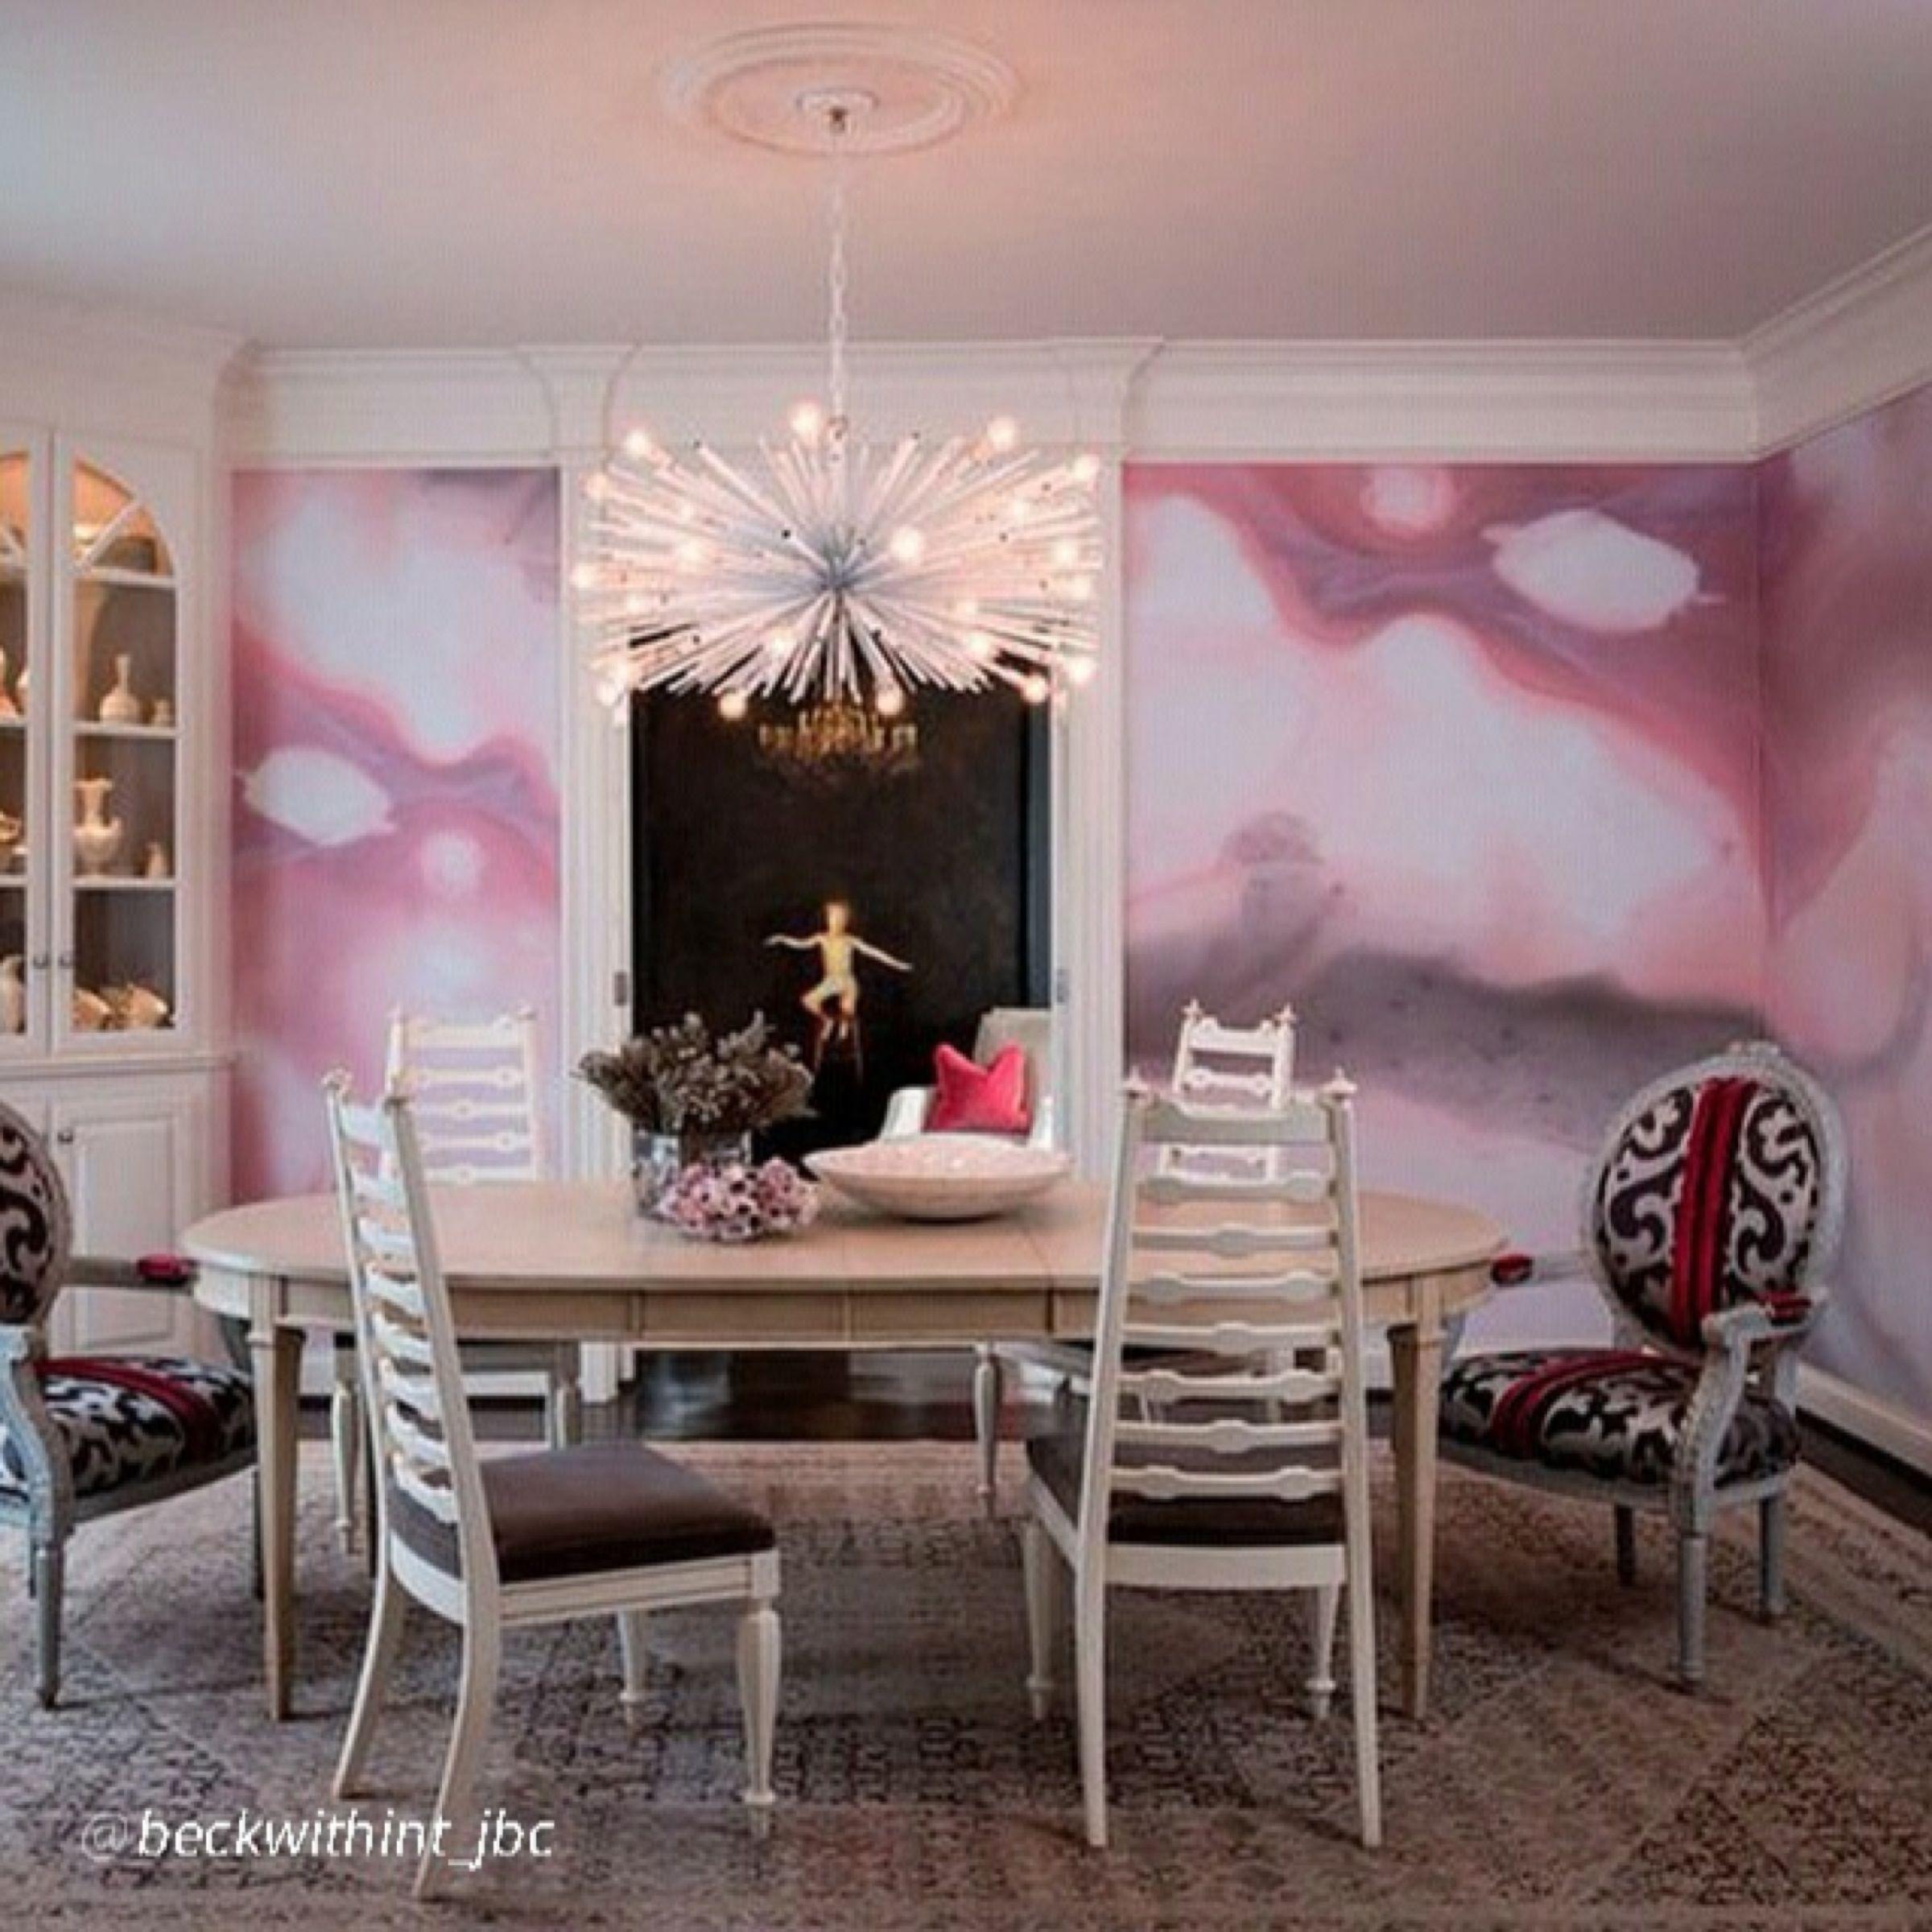 Pin di Ashleigh Rice su Pink n pretty | Pinterest